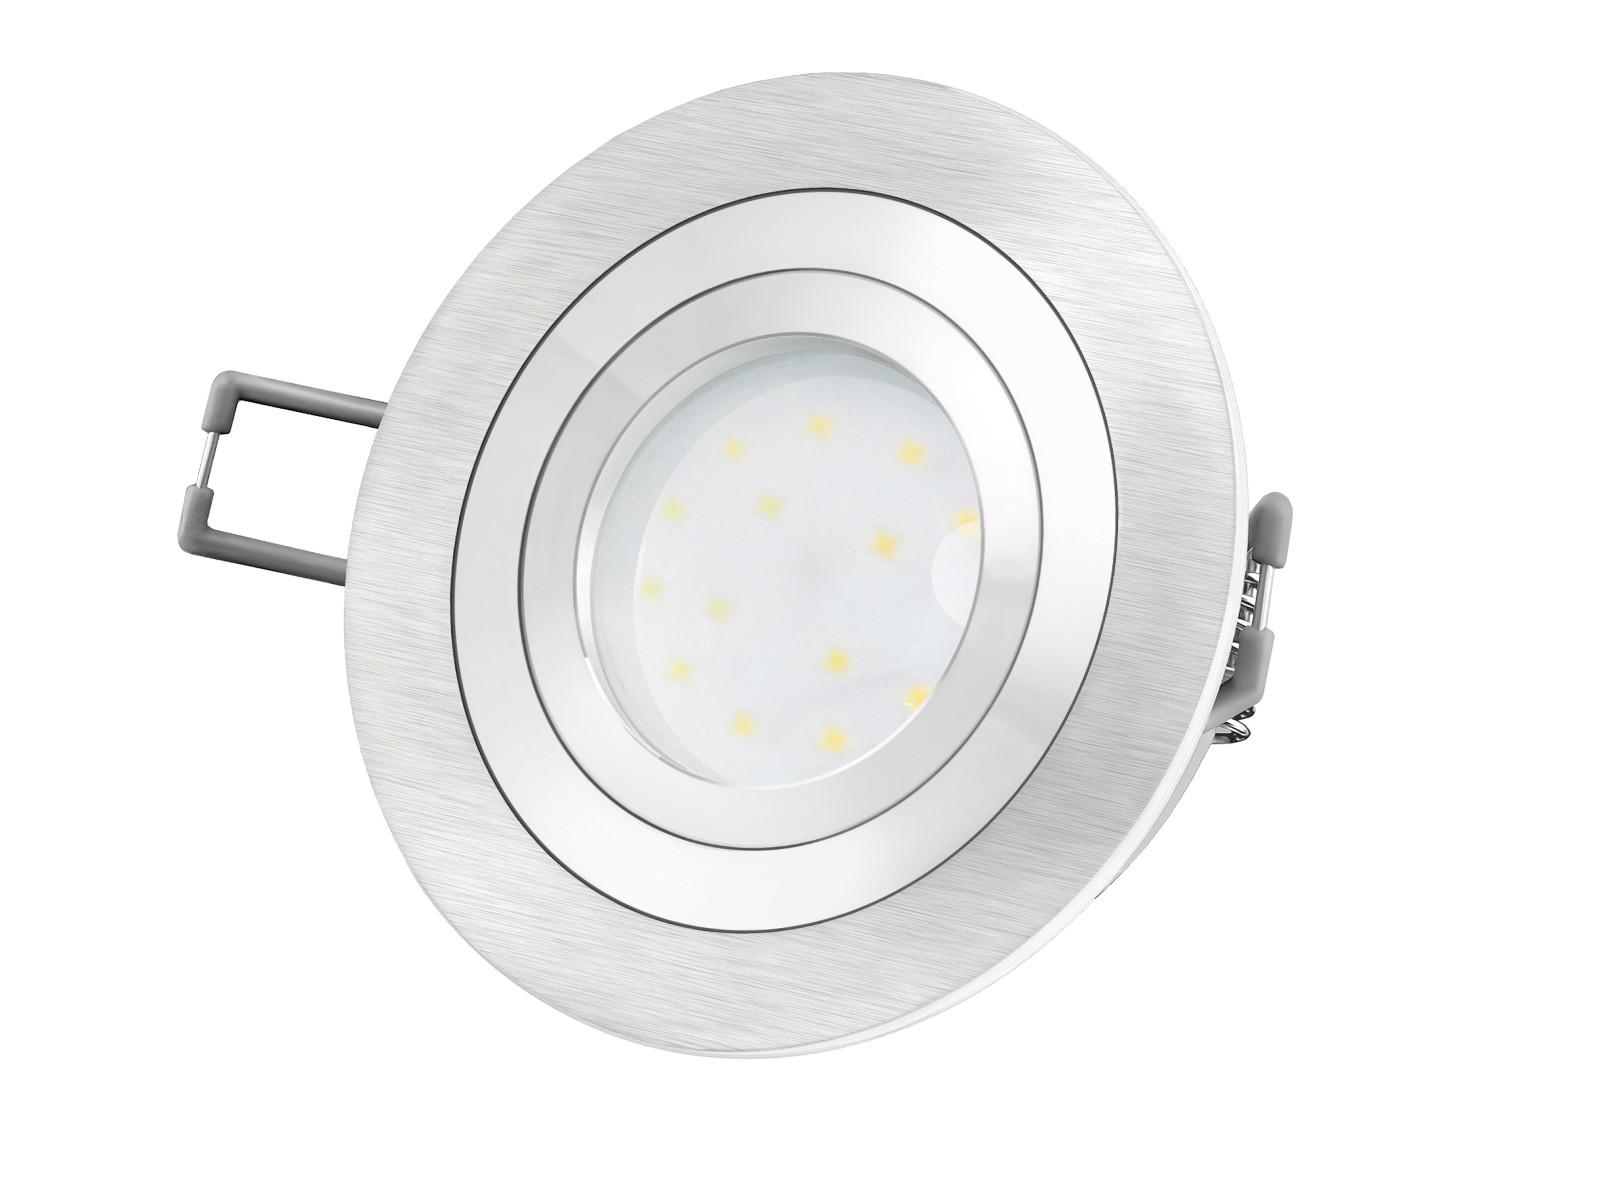 5W LED Module Flach Modul Leuchtmittel einbaustrahler SMD MR16 GU10  dimmbar